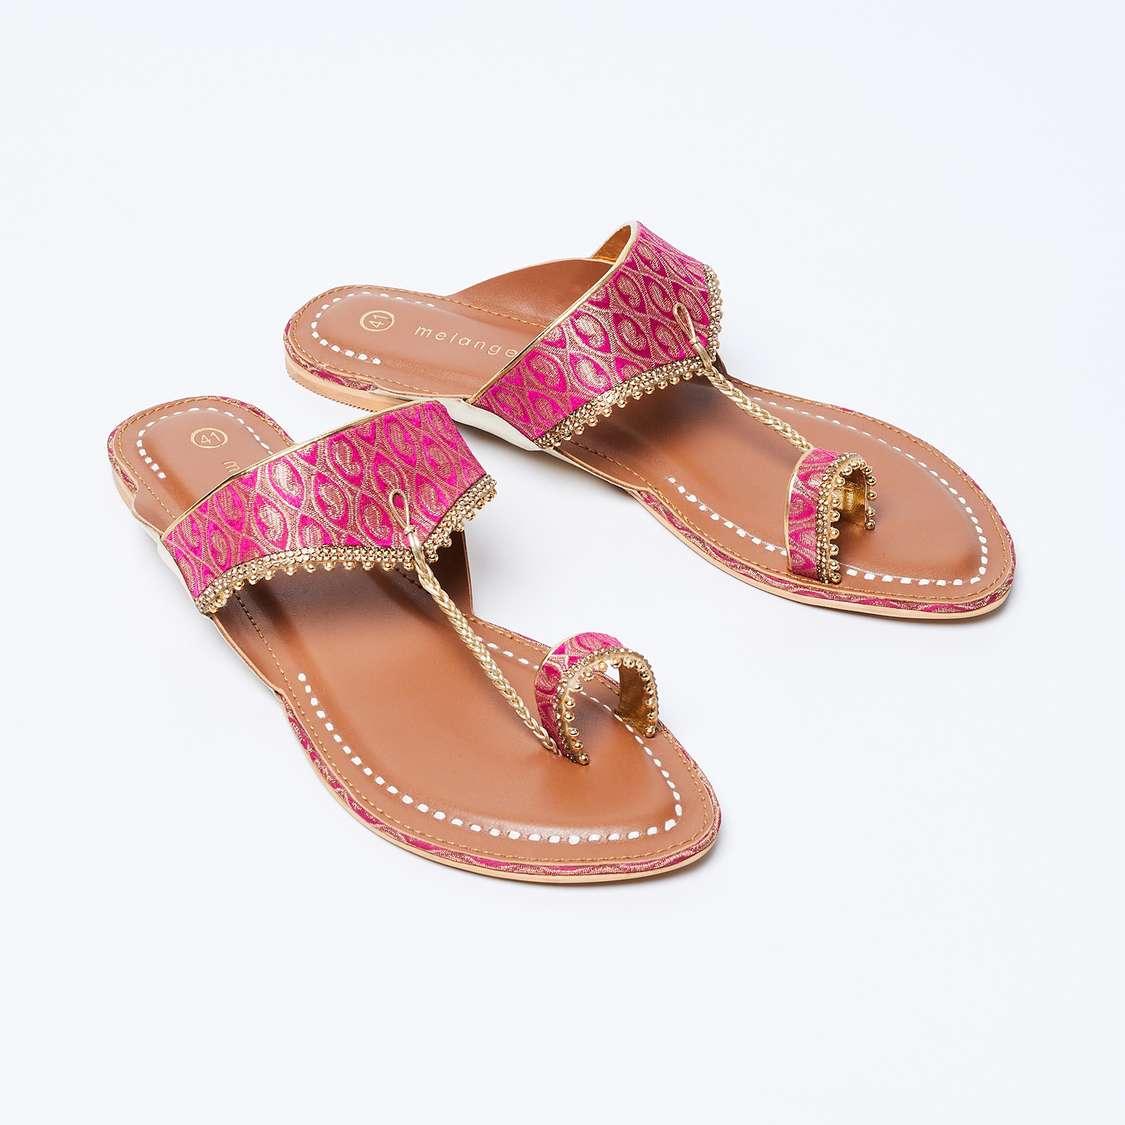 MELANGE Jacquard Patterned Toe-Ring Flats